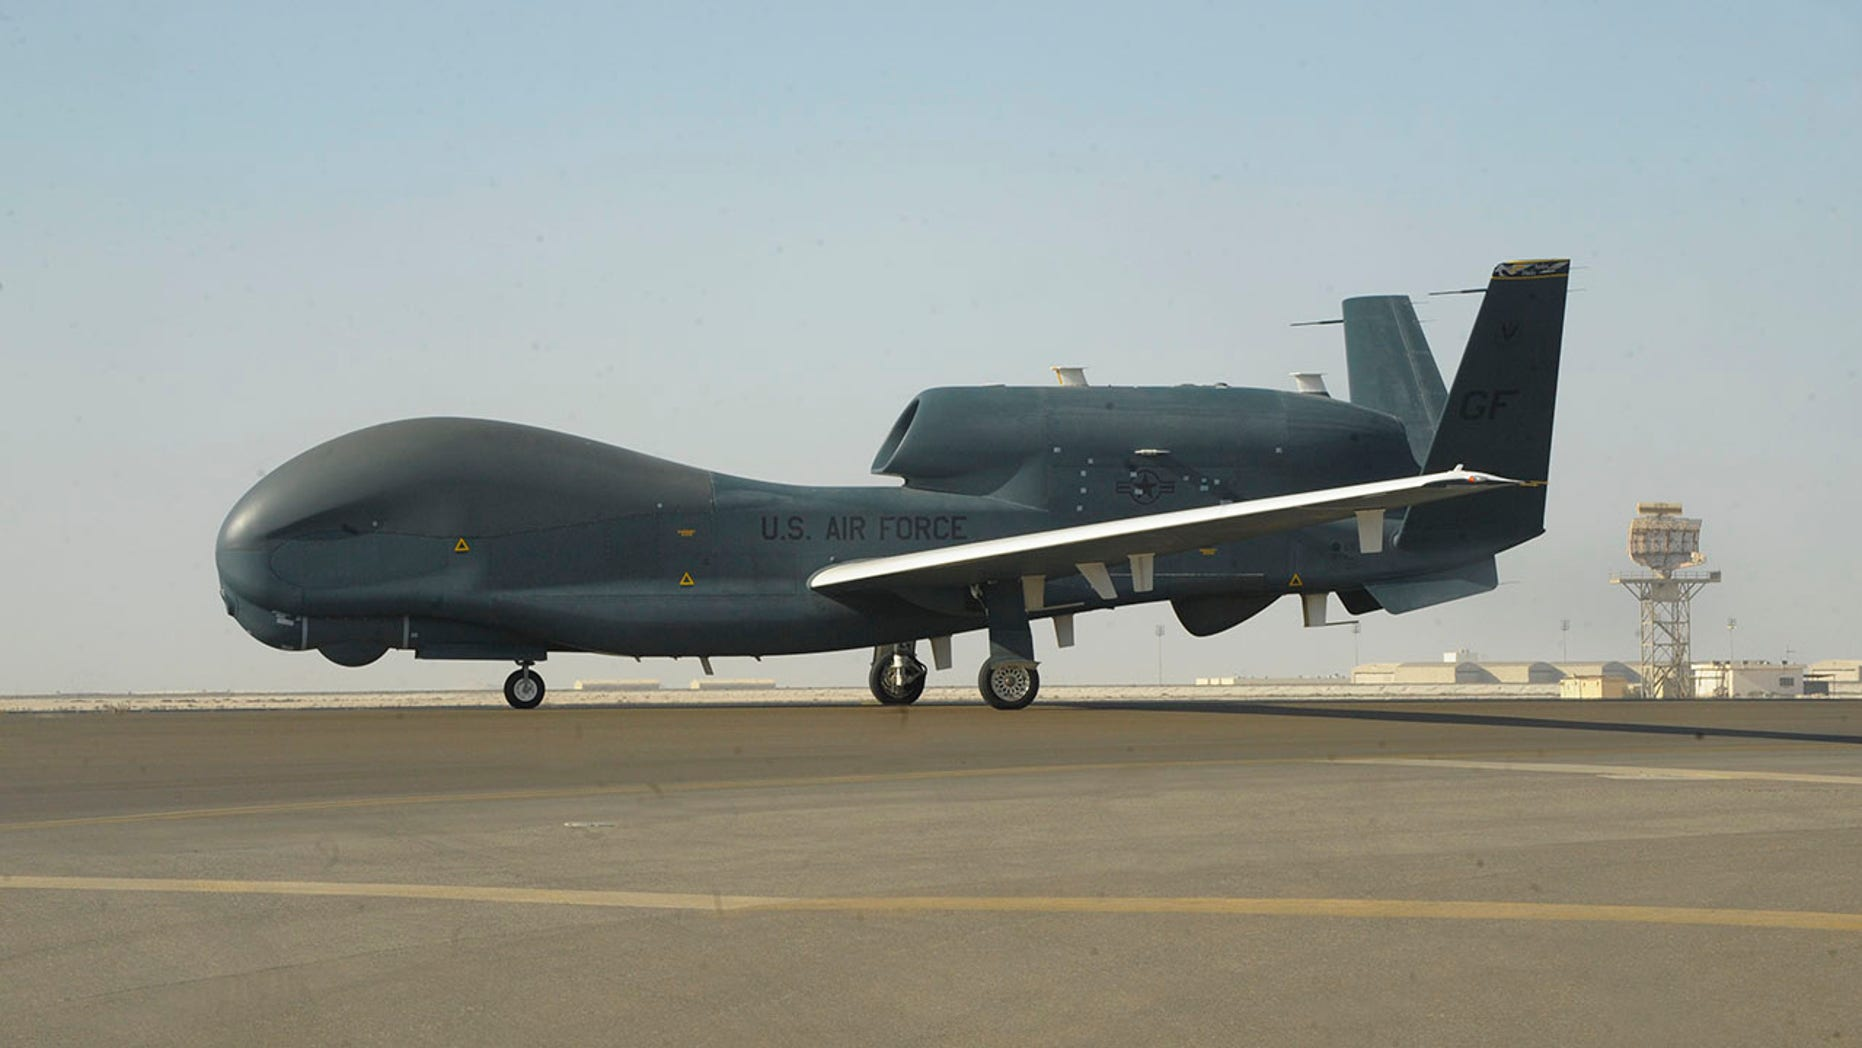 The US Air Force photograph of a RQ-4 Global Hawk can be seen on the tarmac at Al-Dhafra Air Base near Abu Dhabi, United Arab Emirates. Blake Browning / US Air Force (AP) [AP]